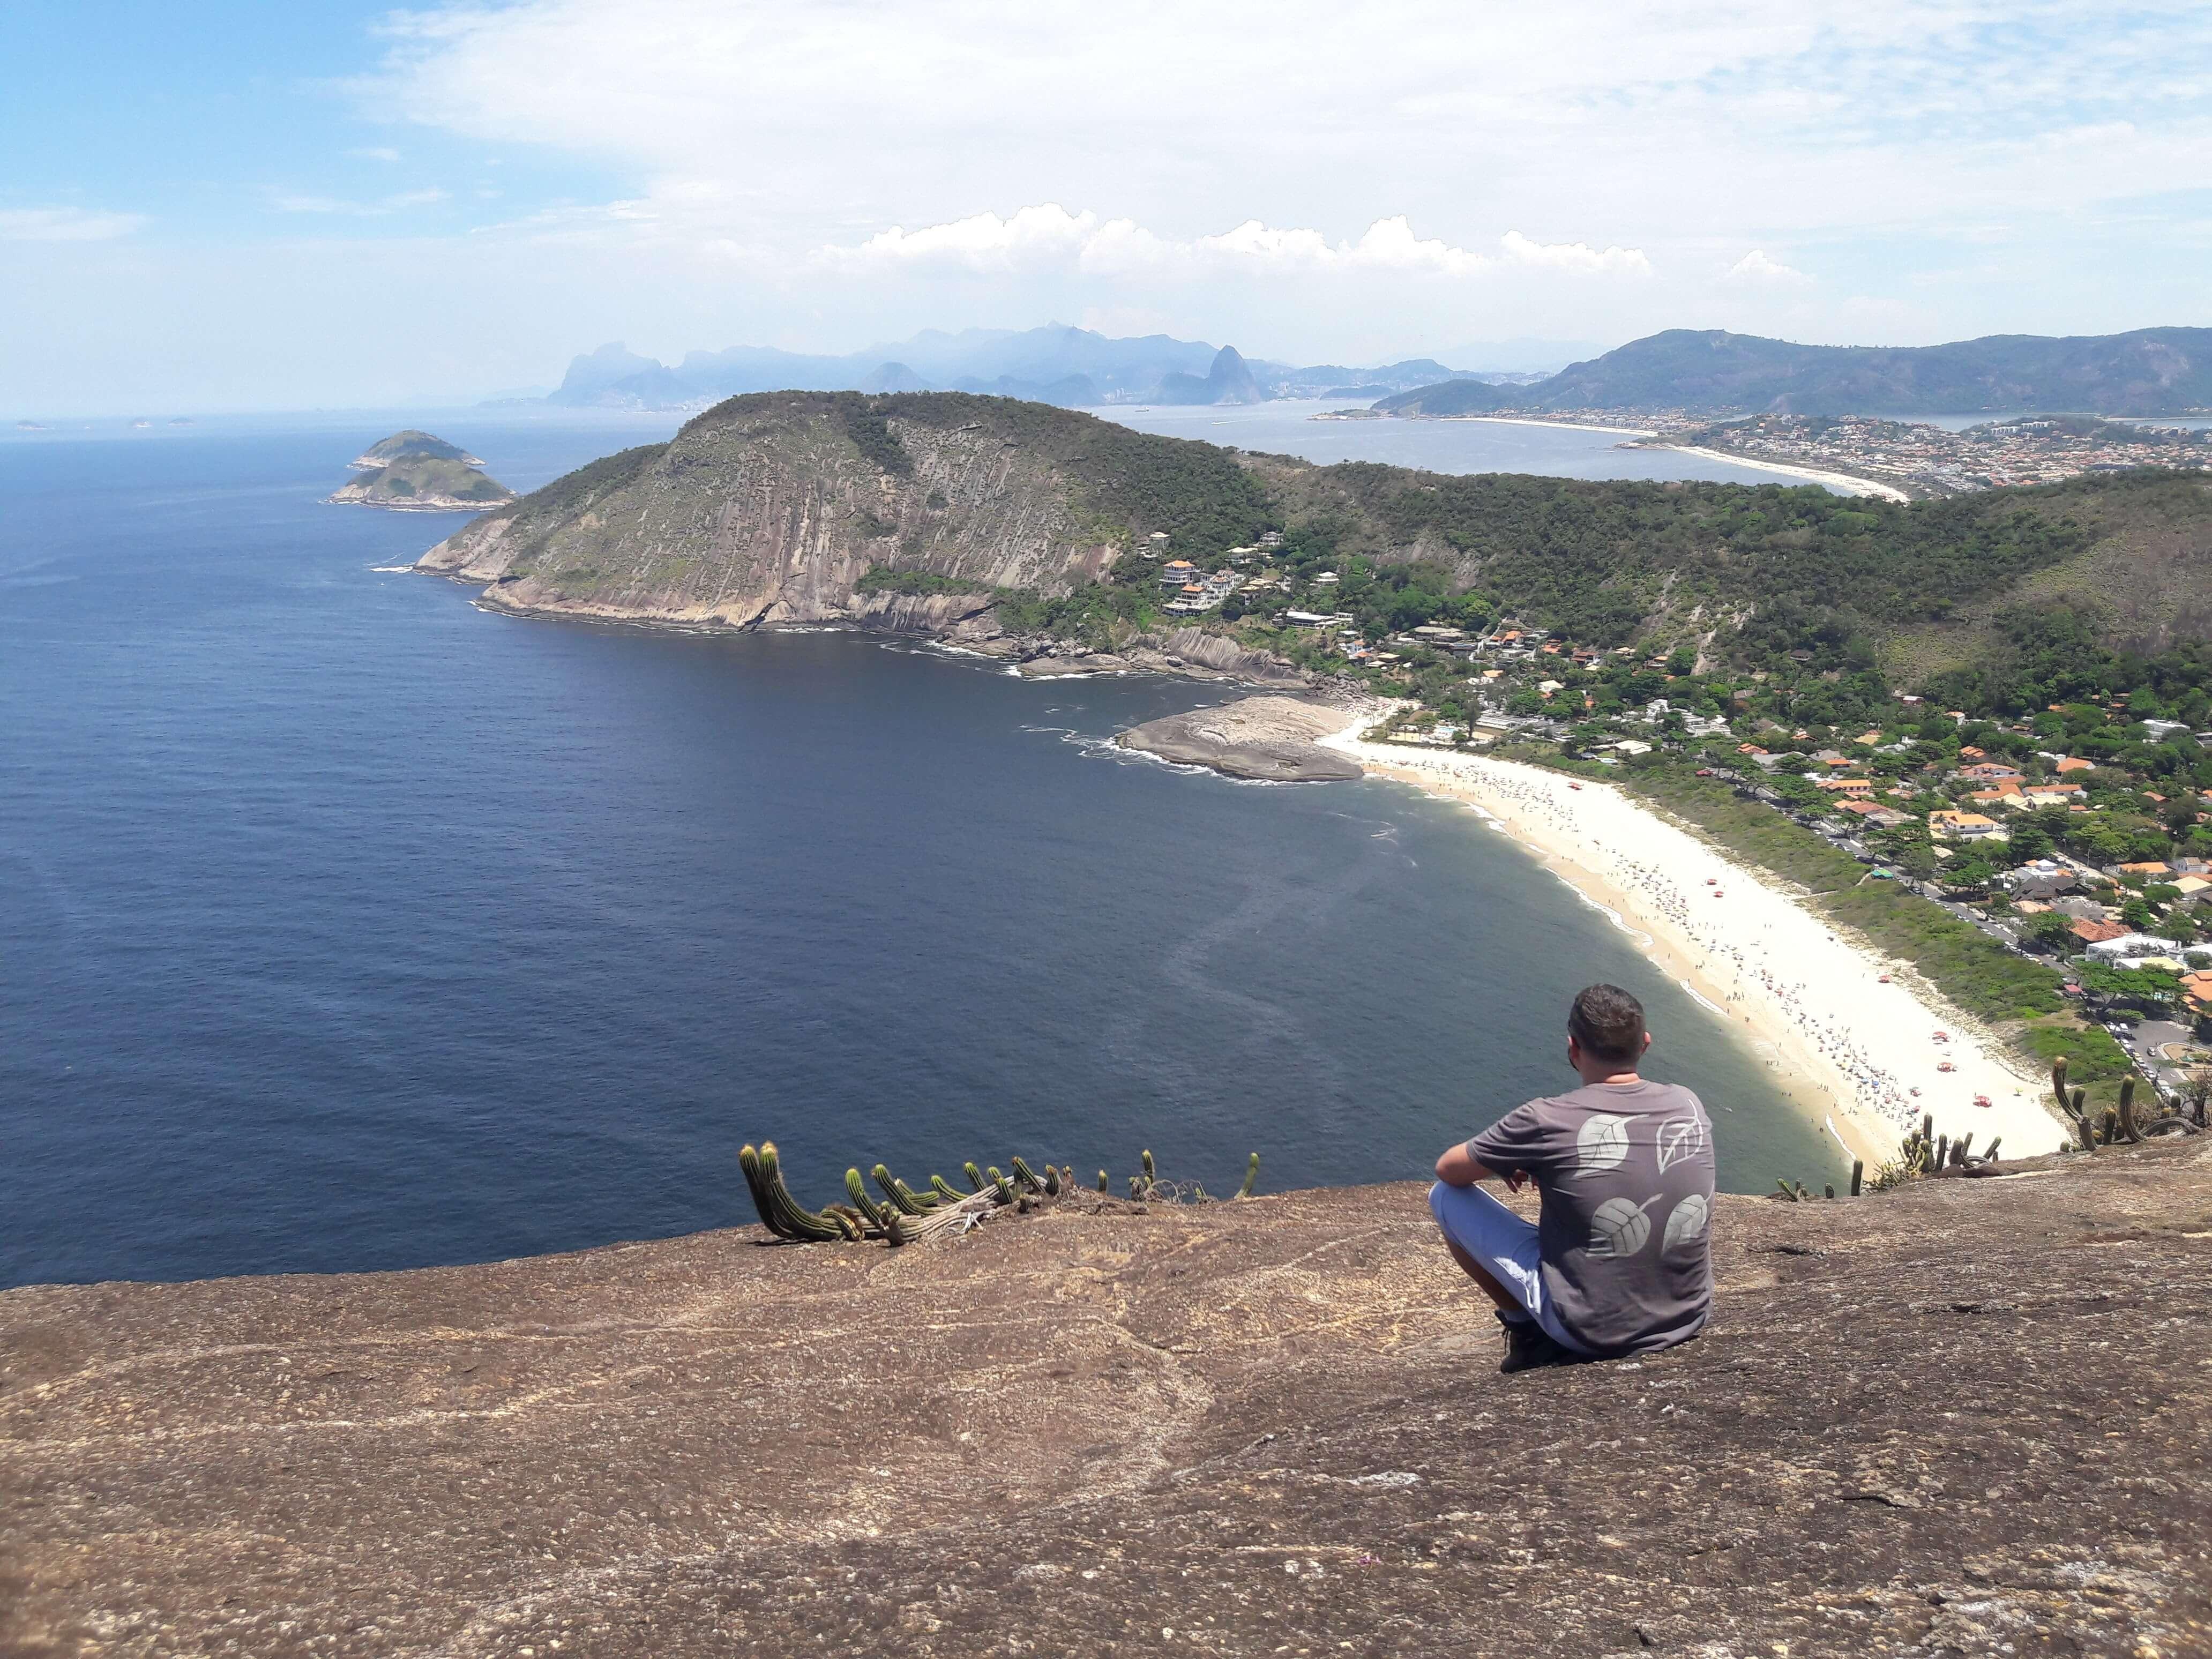 Praia, lago, montanha e o Rio de Janeiro